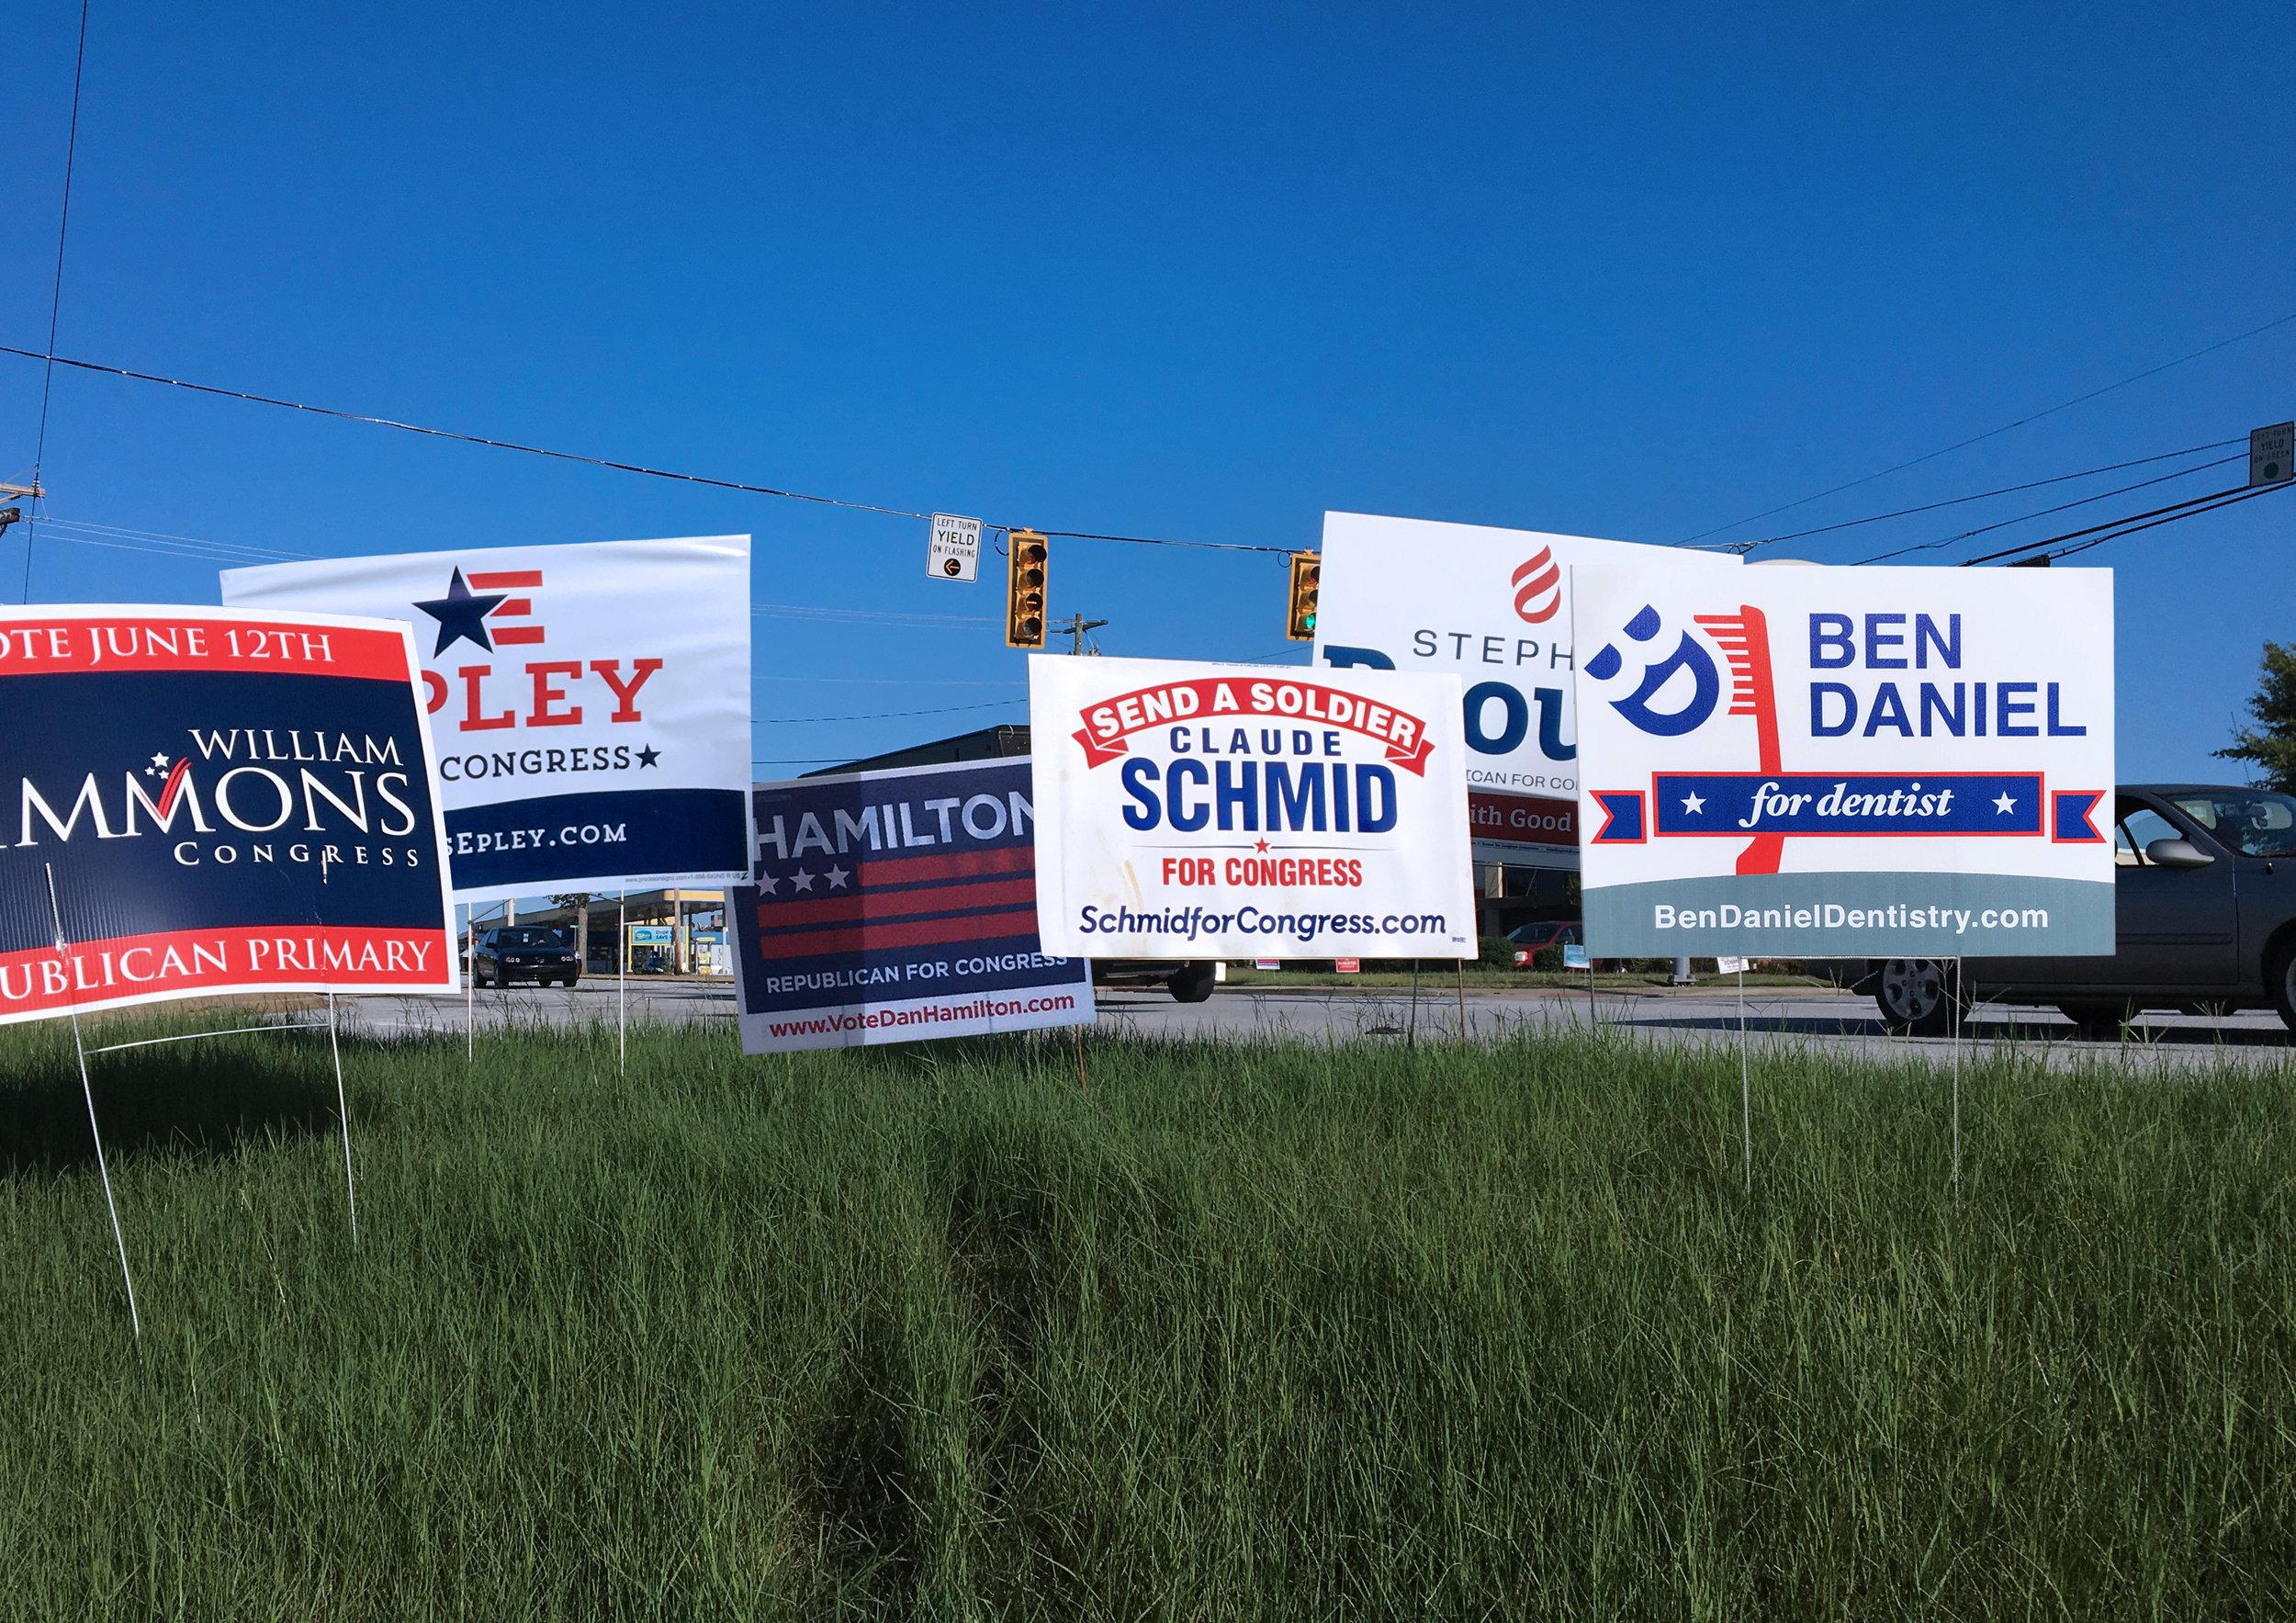 vote-guerilla-marketing-Ben-Daniel-for-dentist-no mockup.jpg